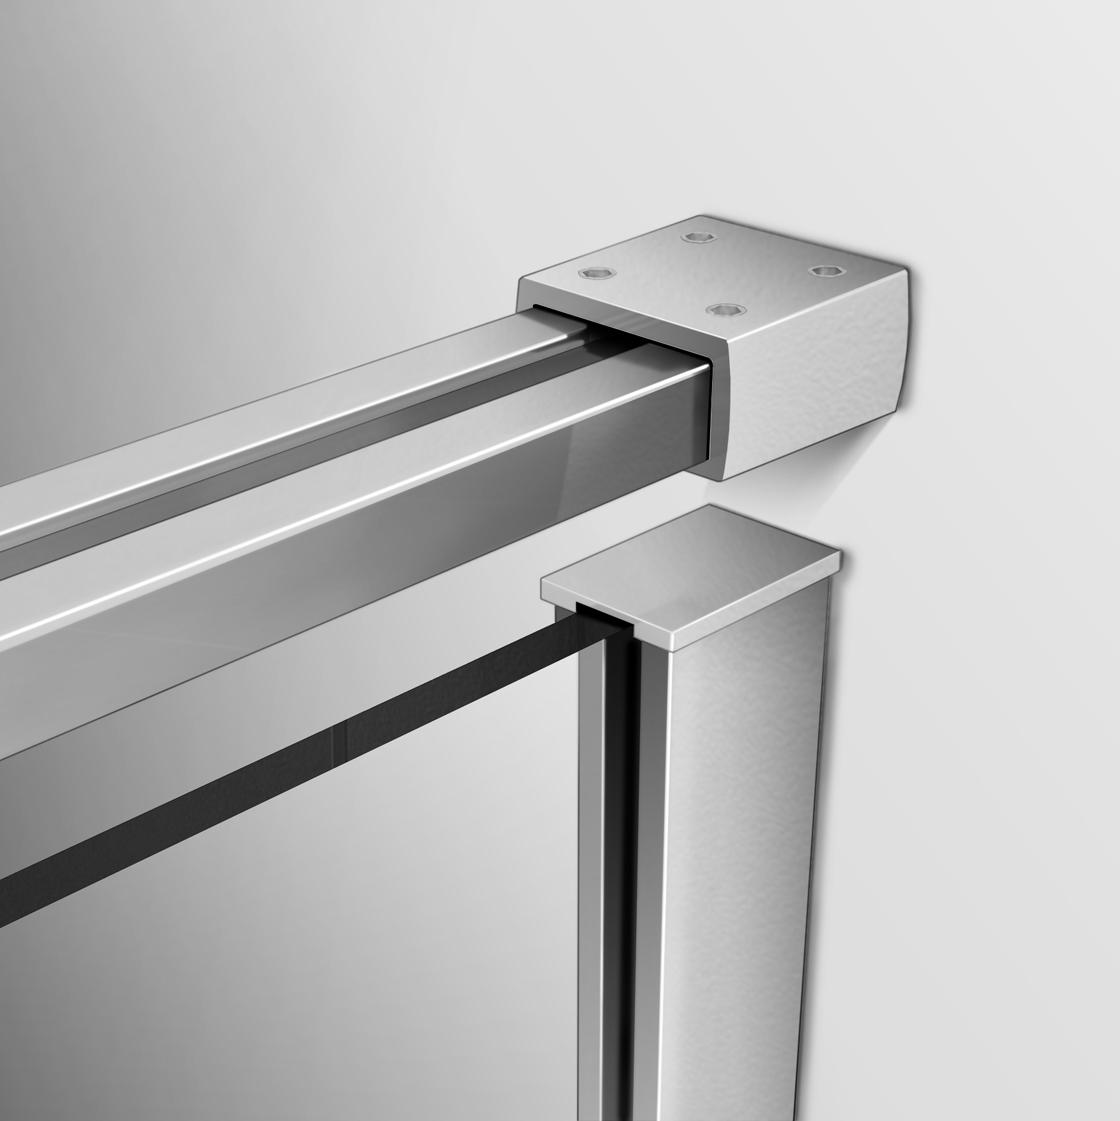 Dusche Glaswand Nano : in Dusche Duschwand Duschabtrennun g Echtglas 8mm NANO-Beschicht ung